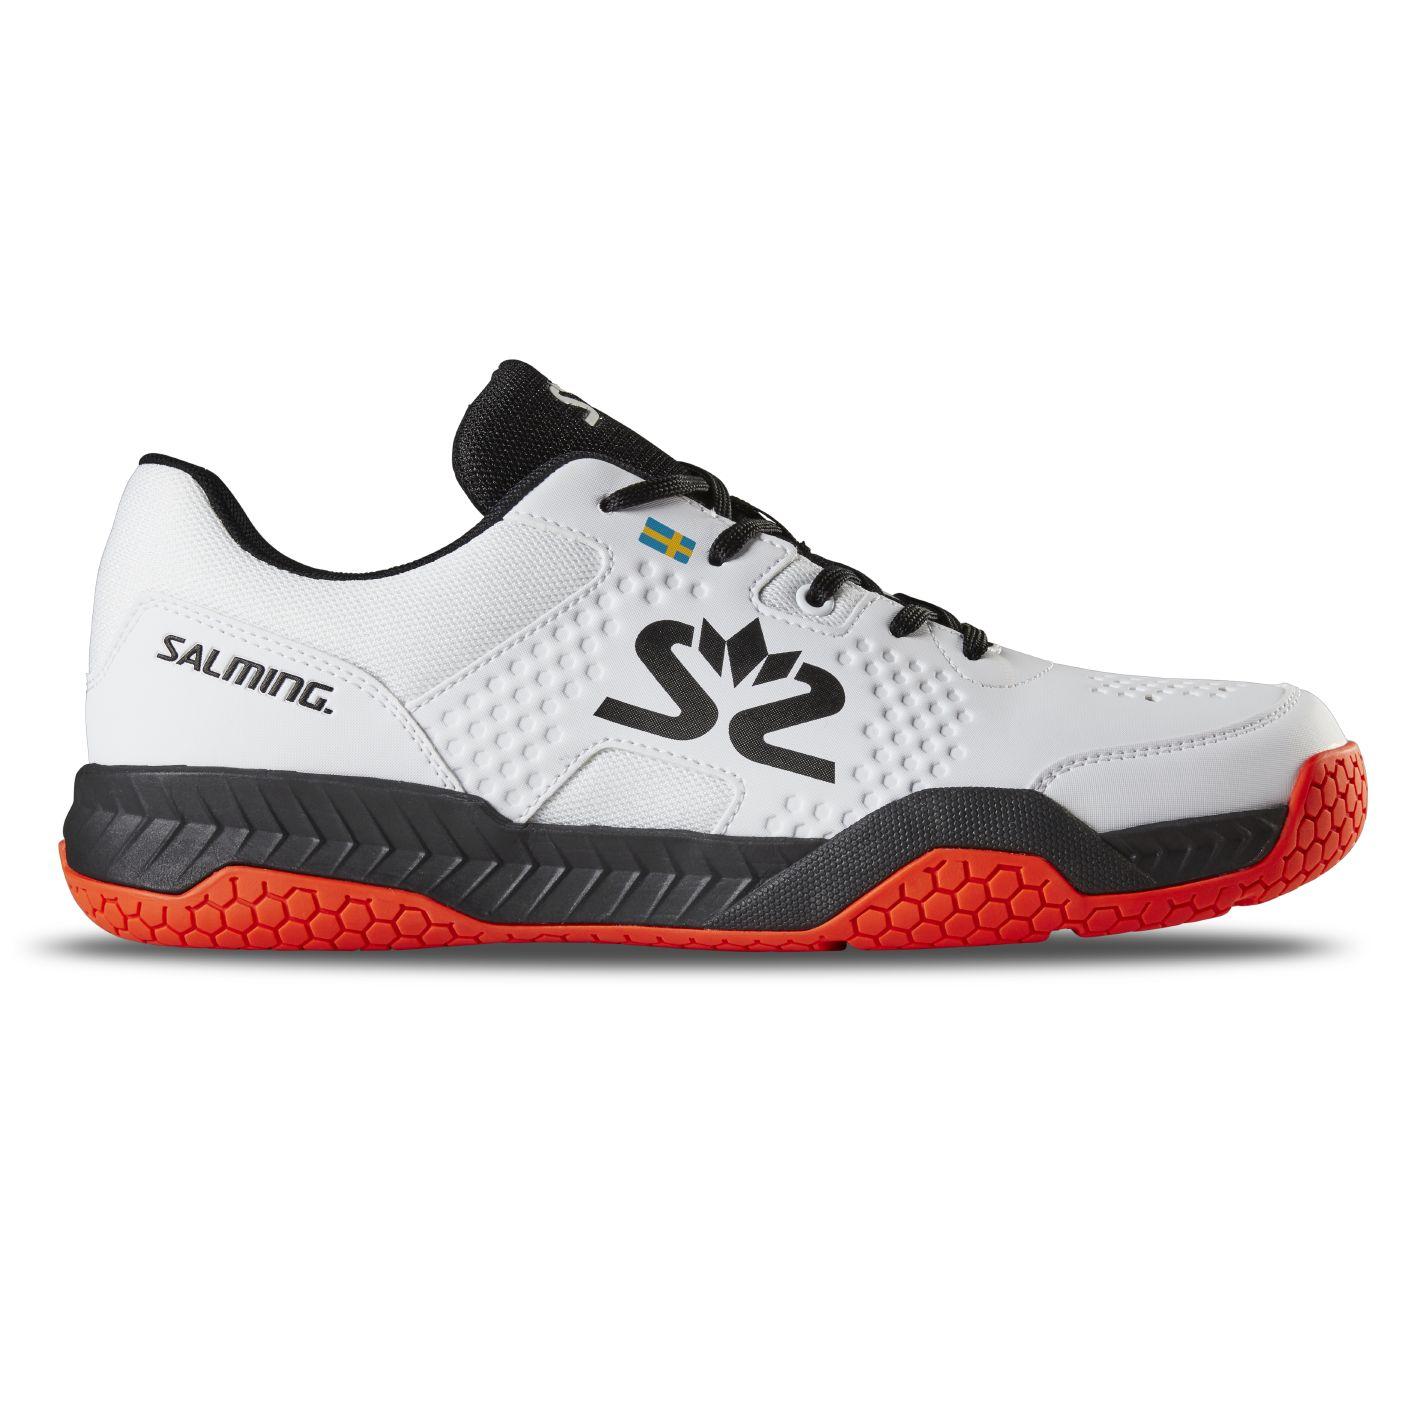 Salming Hawk Court Shoe Men White/Black 10,5 UK - 46 EUR - 29,5 cm